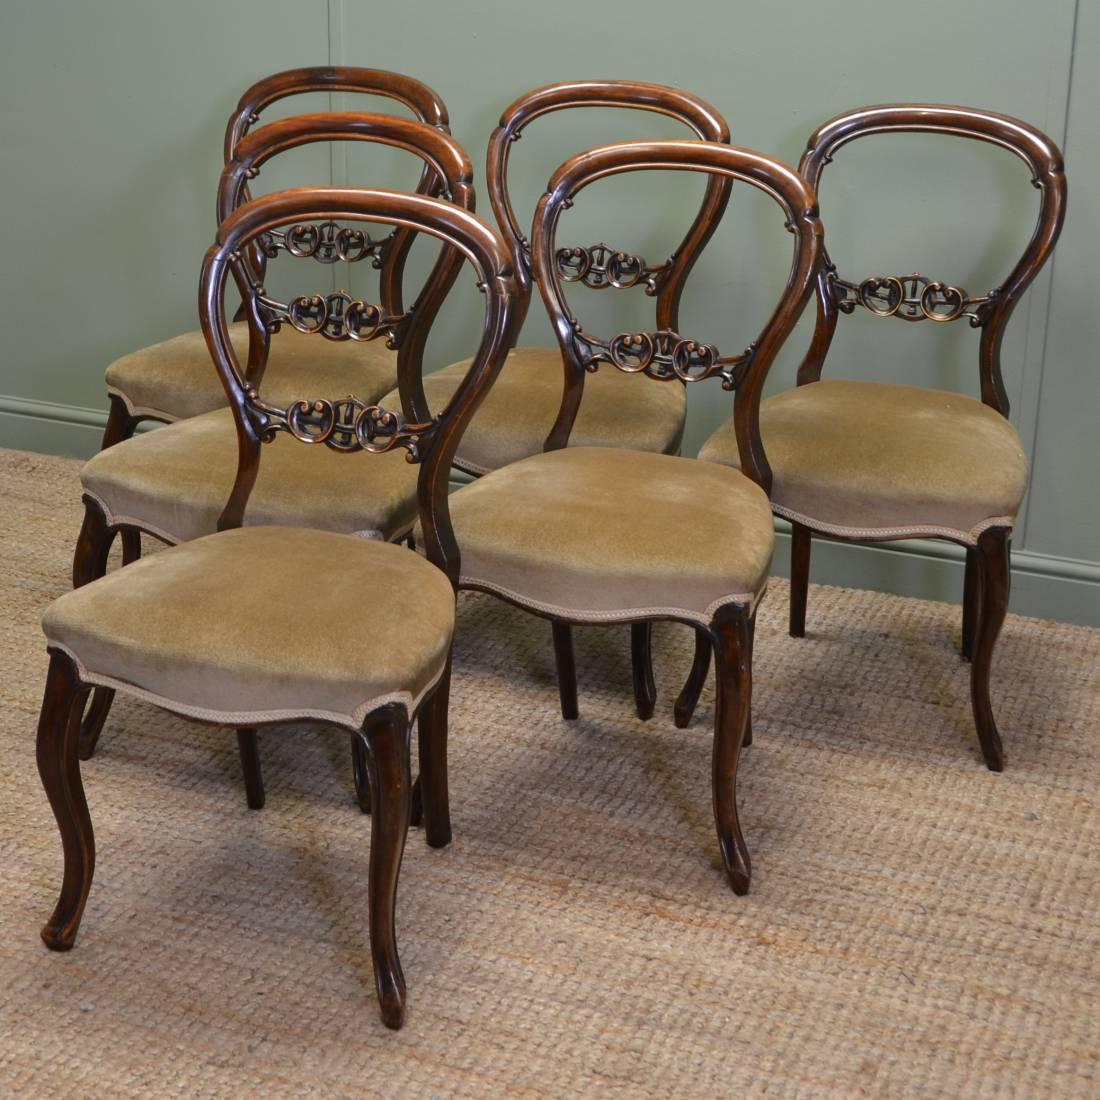 Fine Set Of Six Solid Walnut Victorian Antique Balloon Back Chairs - Fine Set Of Six Solid Walnut Victorian Antique Balloon Back Chairs